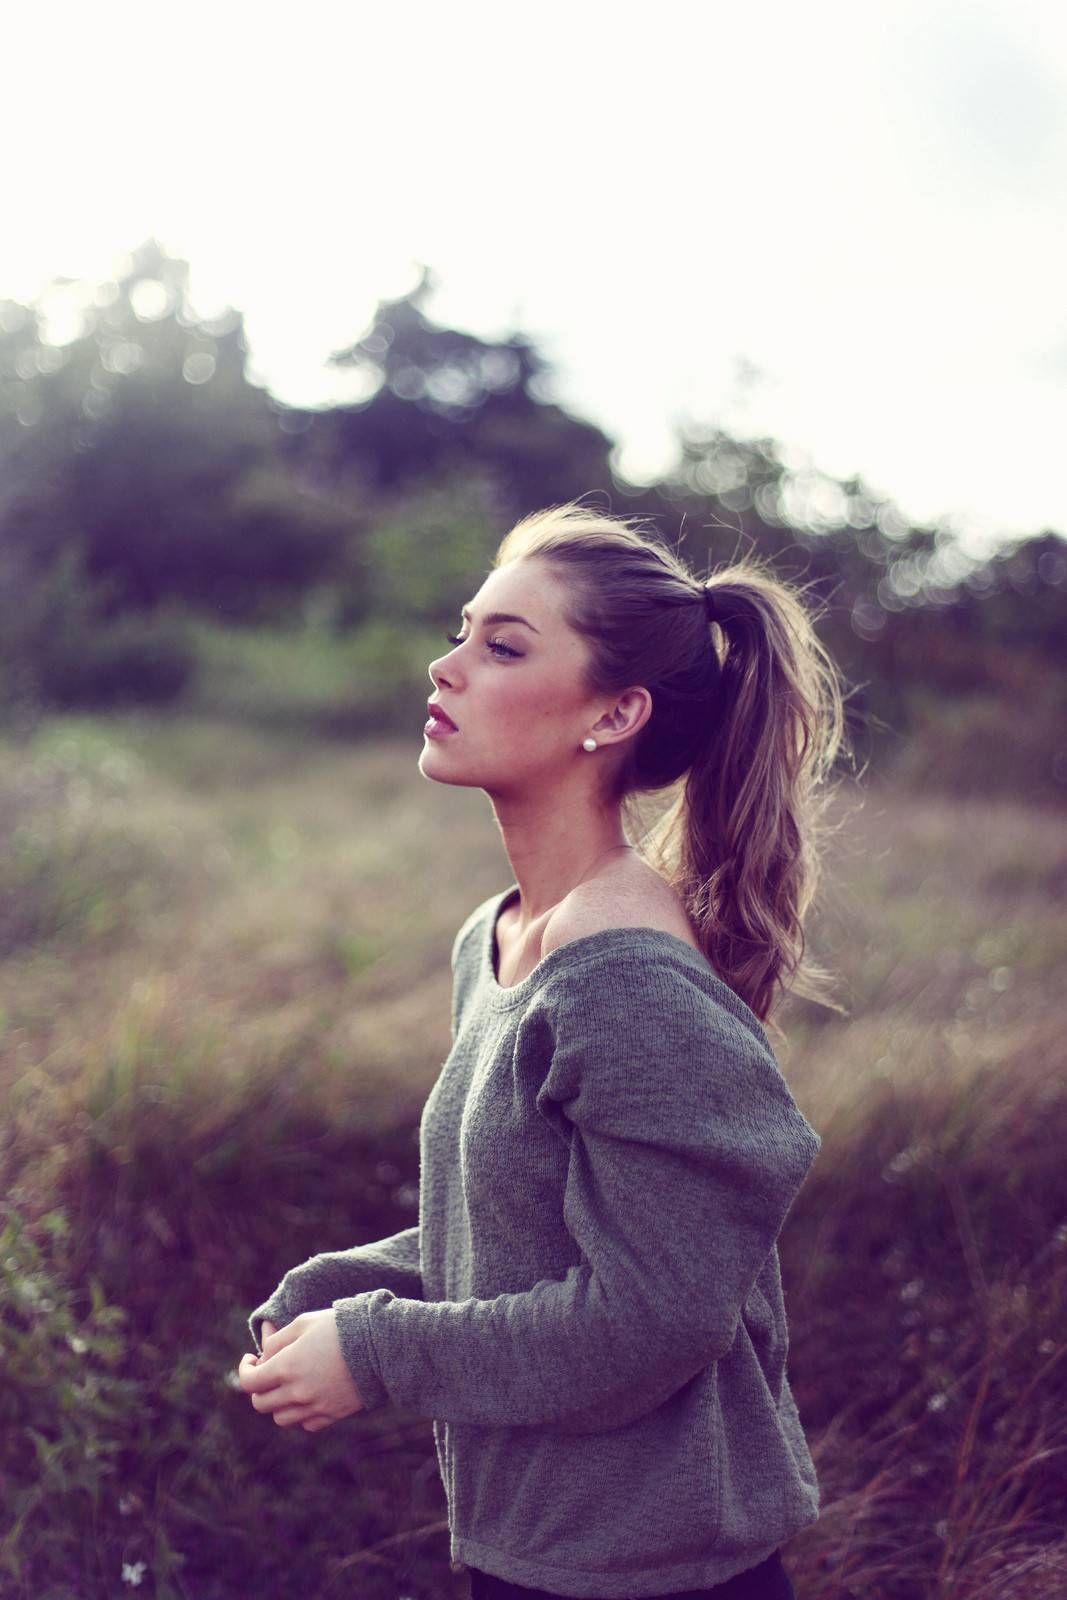 women's hairstyles men love (5) | fun, sexy carefree no boundaries